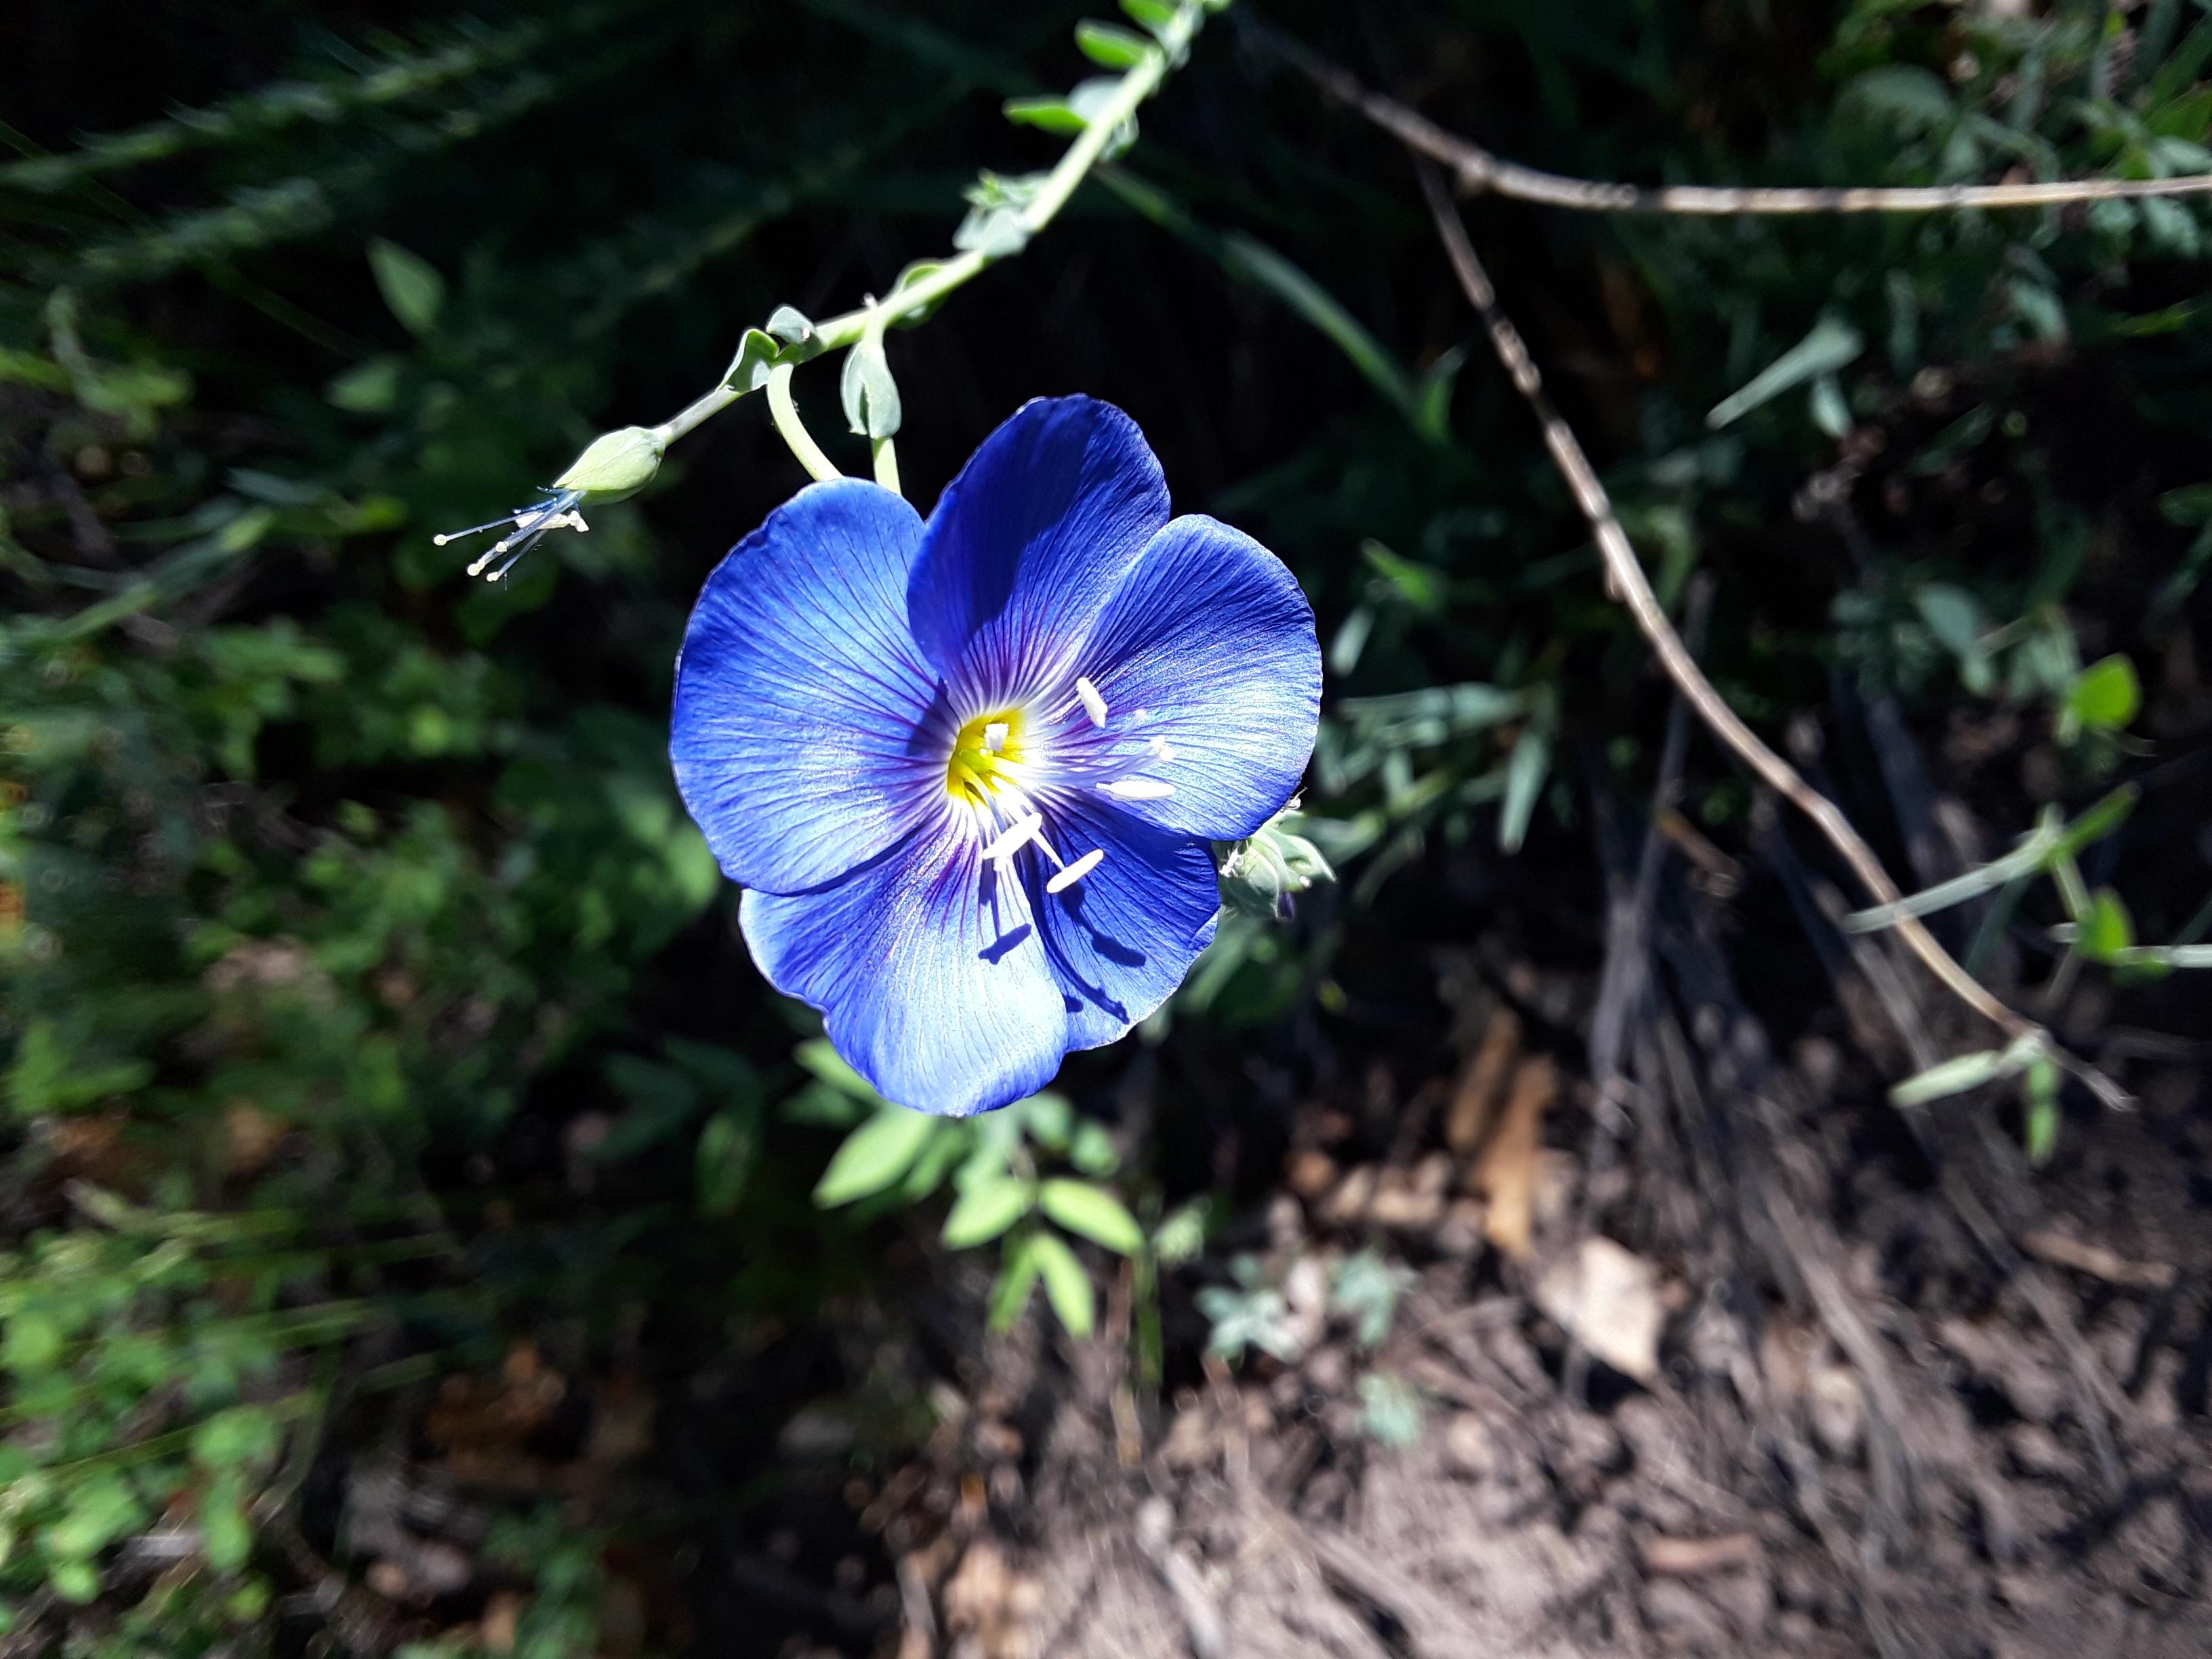 Flax flower has five bright blue petals